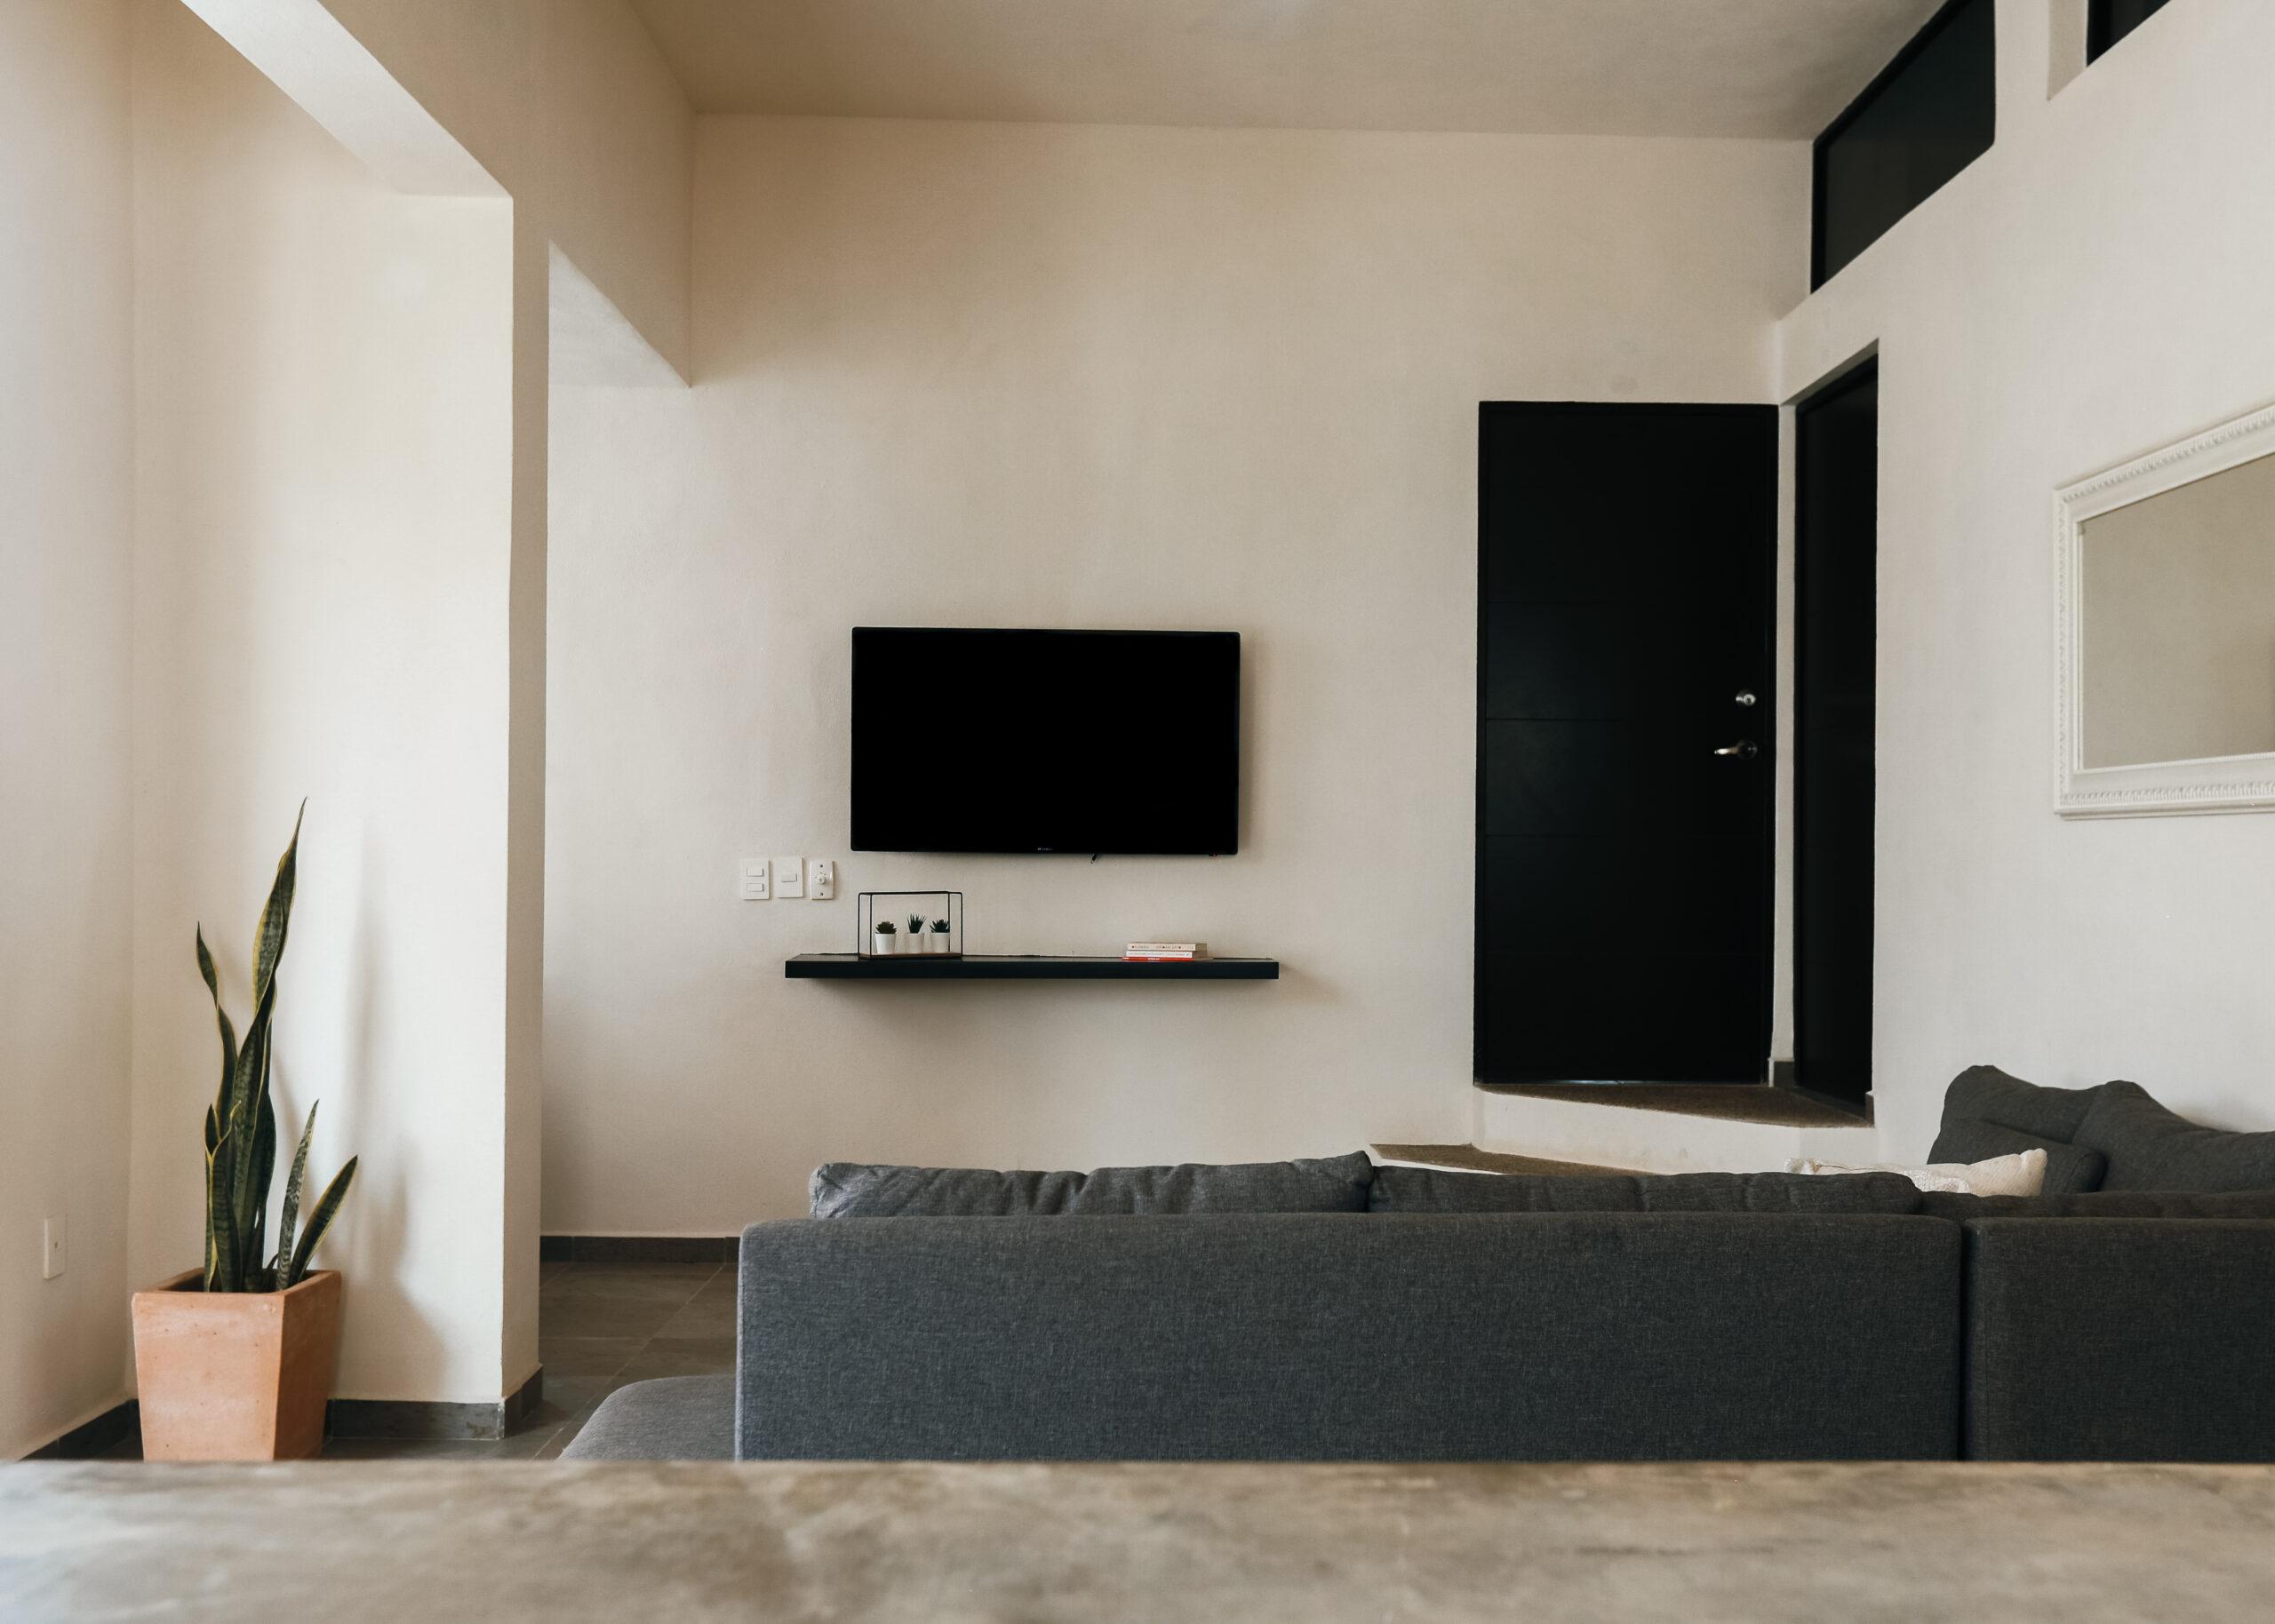 Florence Sayulita - Interior Suite